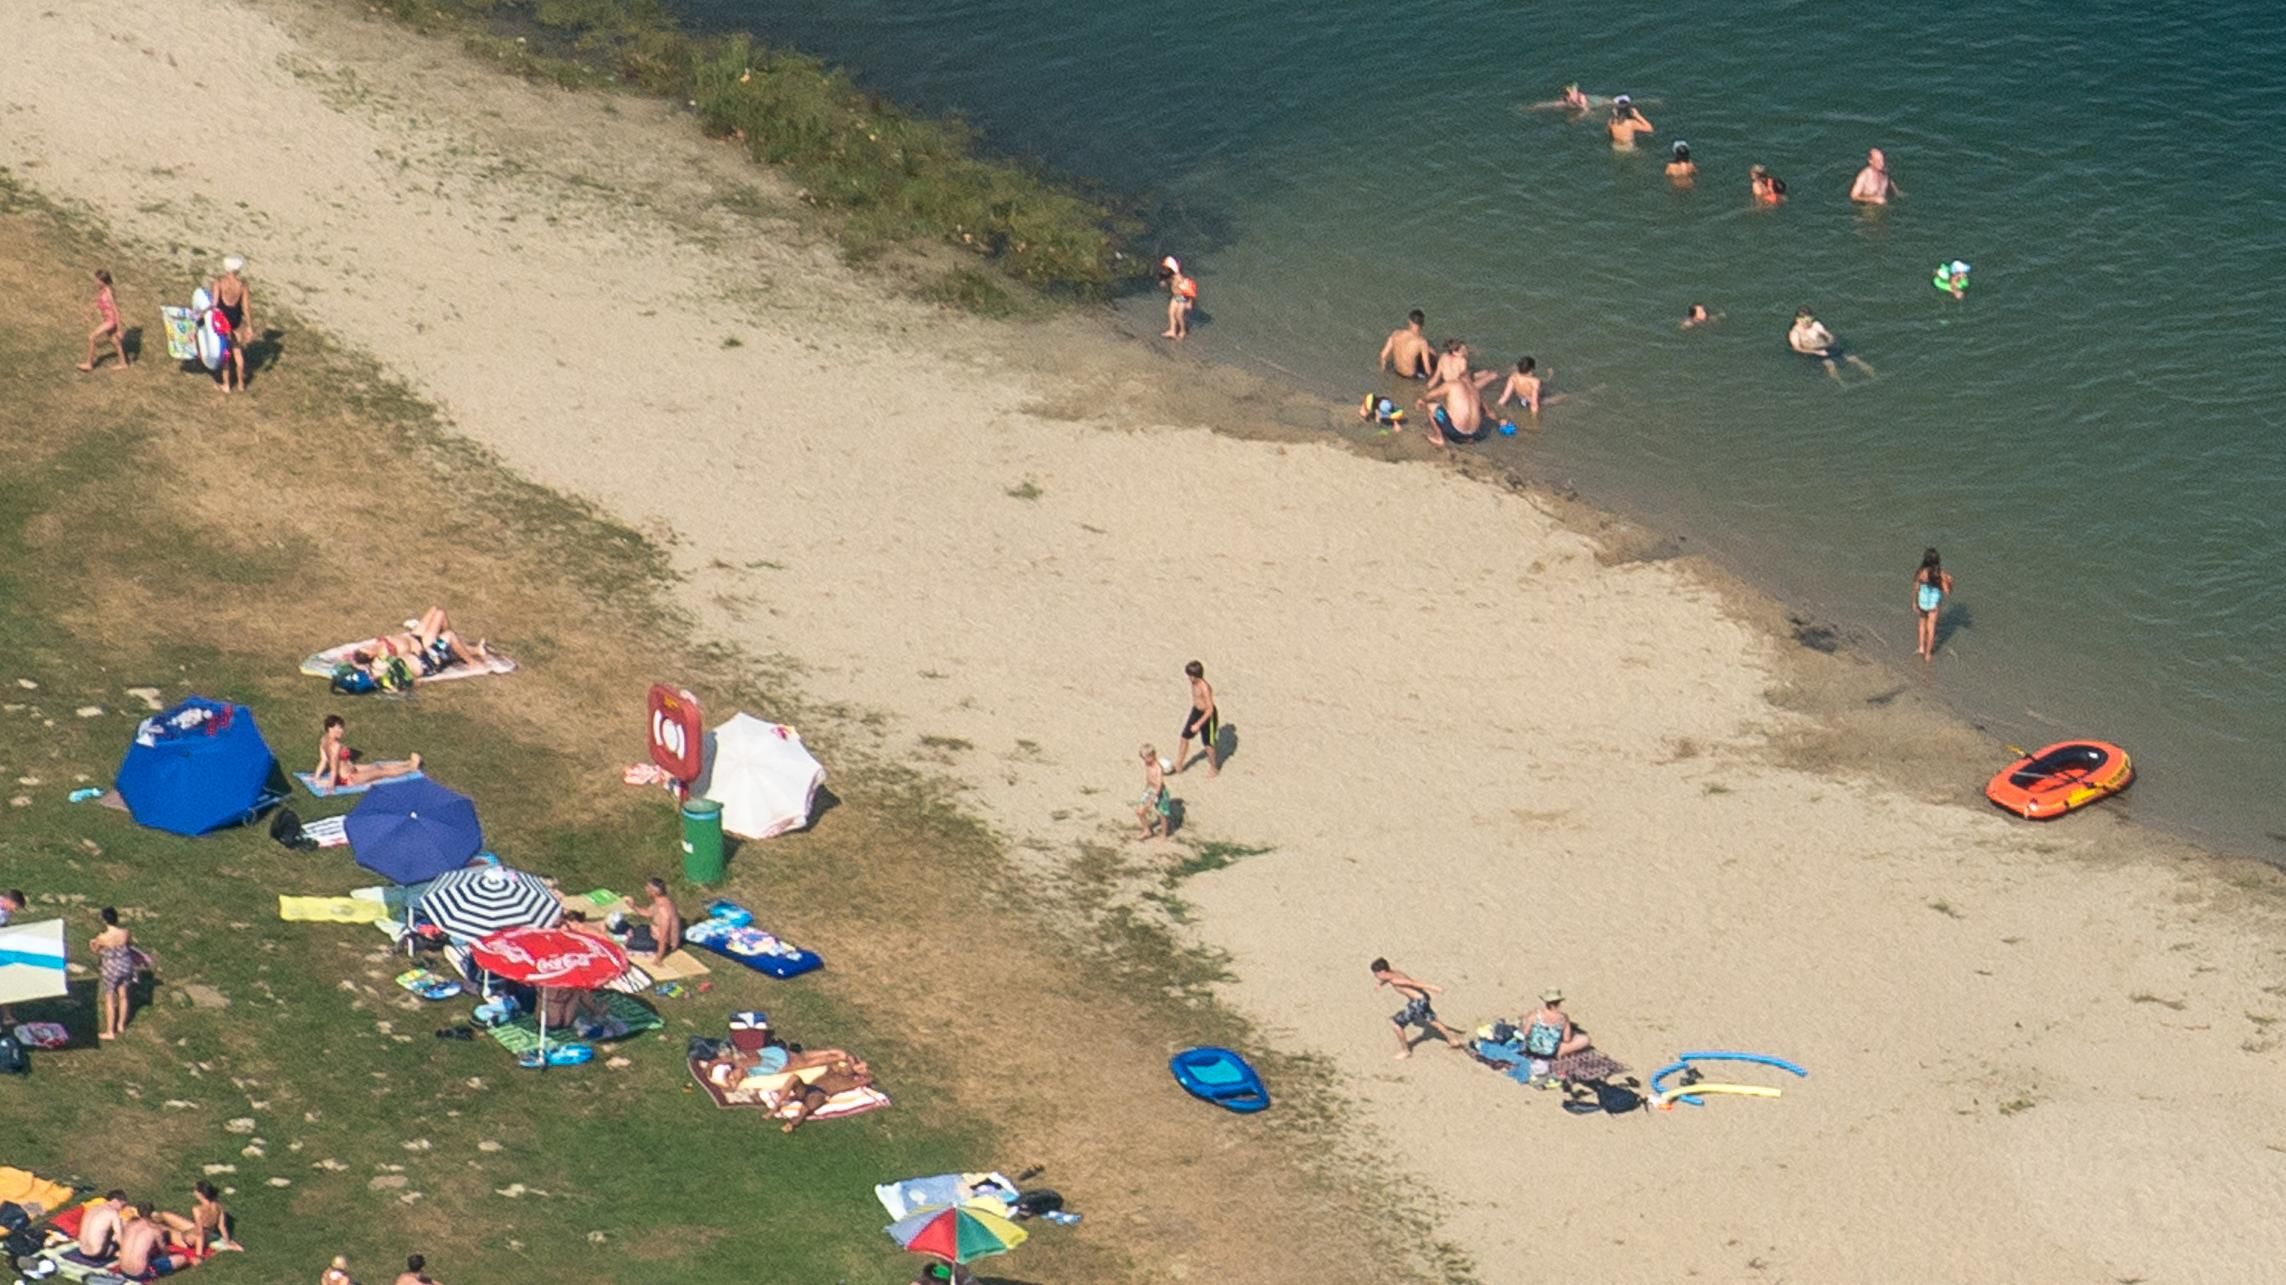 Badegäste an einem Baggersee nahe Parkstetten